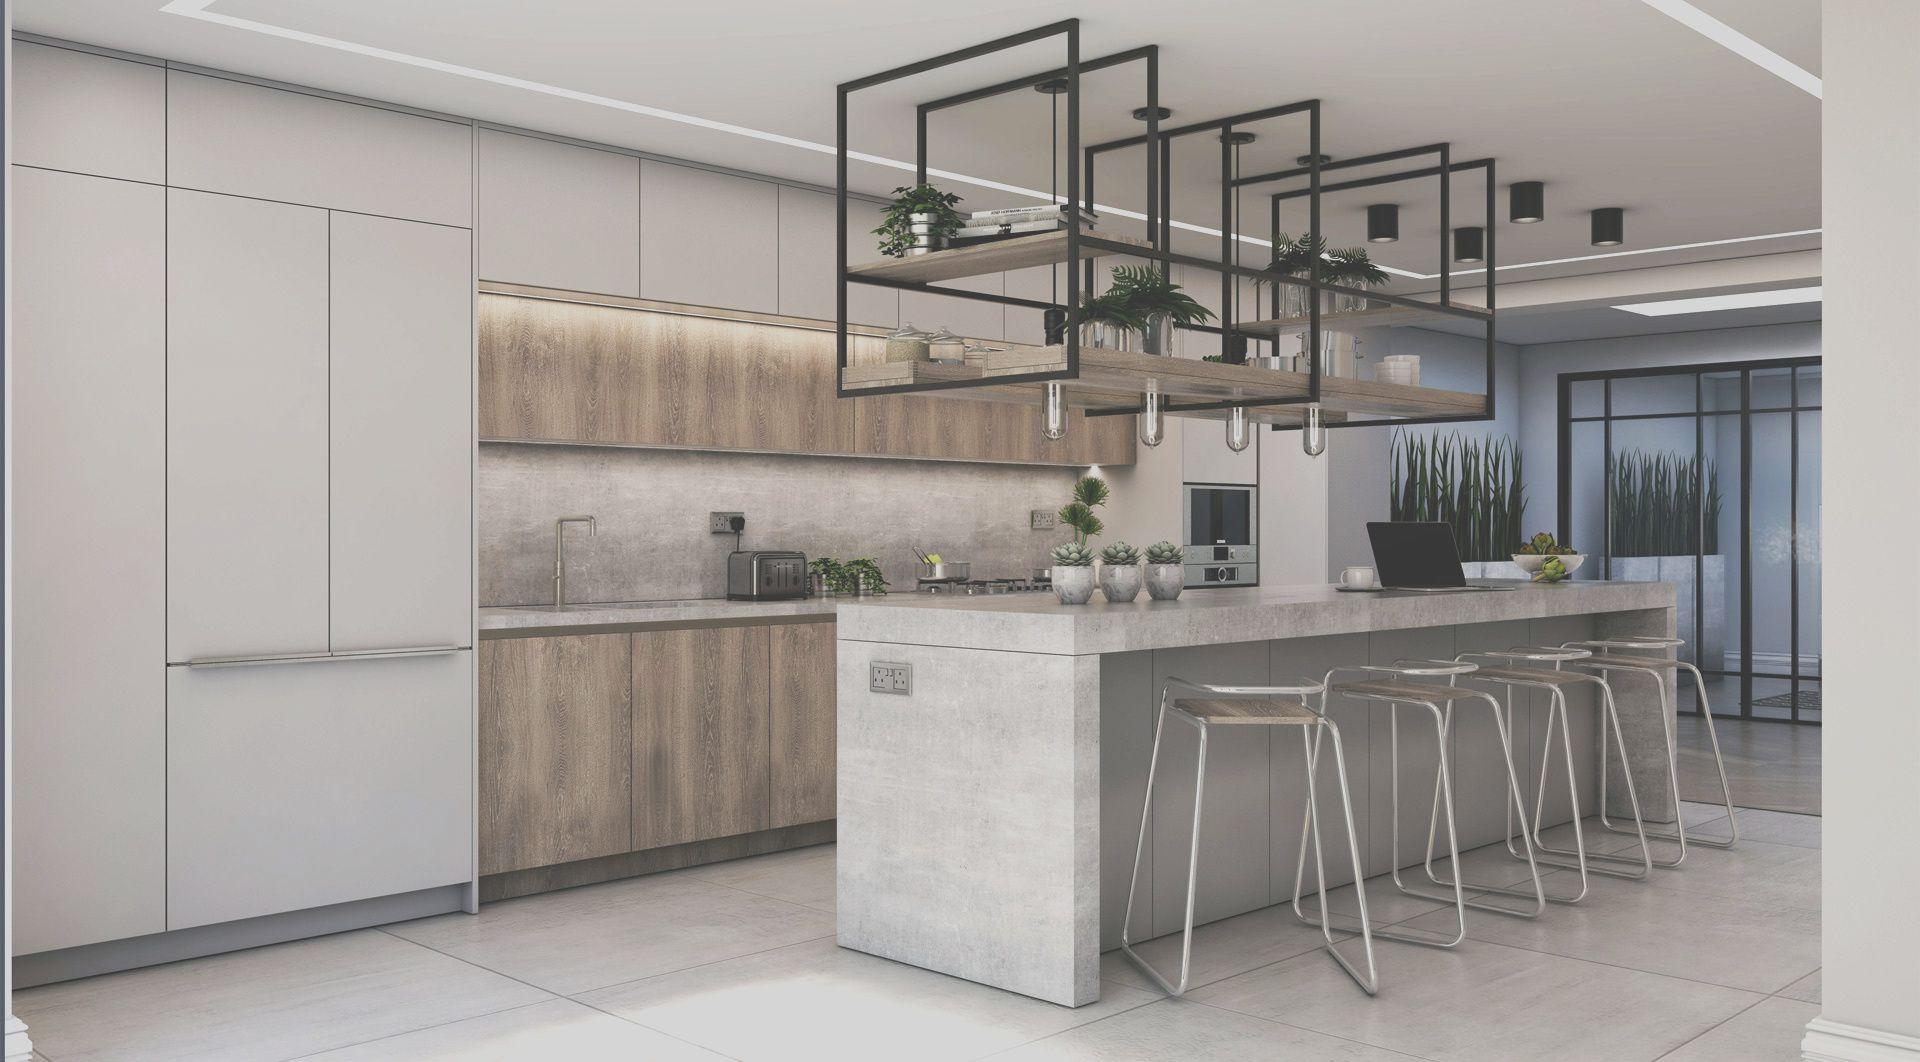 15 Great Kitchen Ideas London Collection In 2020 Kitchen Furniture Design Small Kitchen Ideas On A Budget Kitchen Design